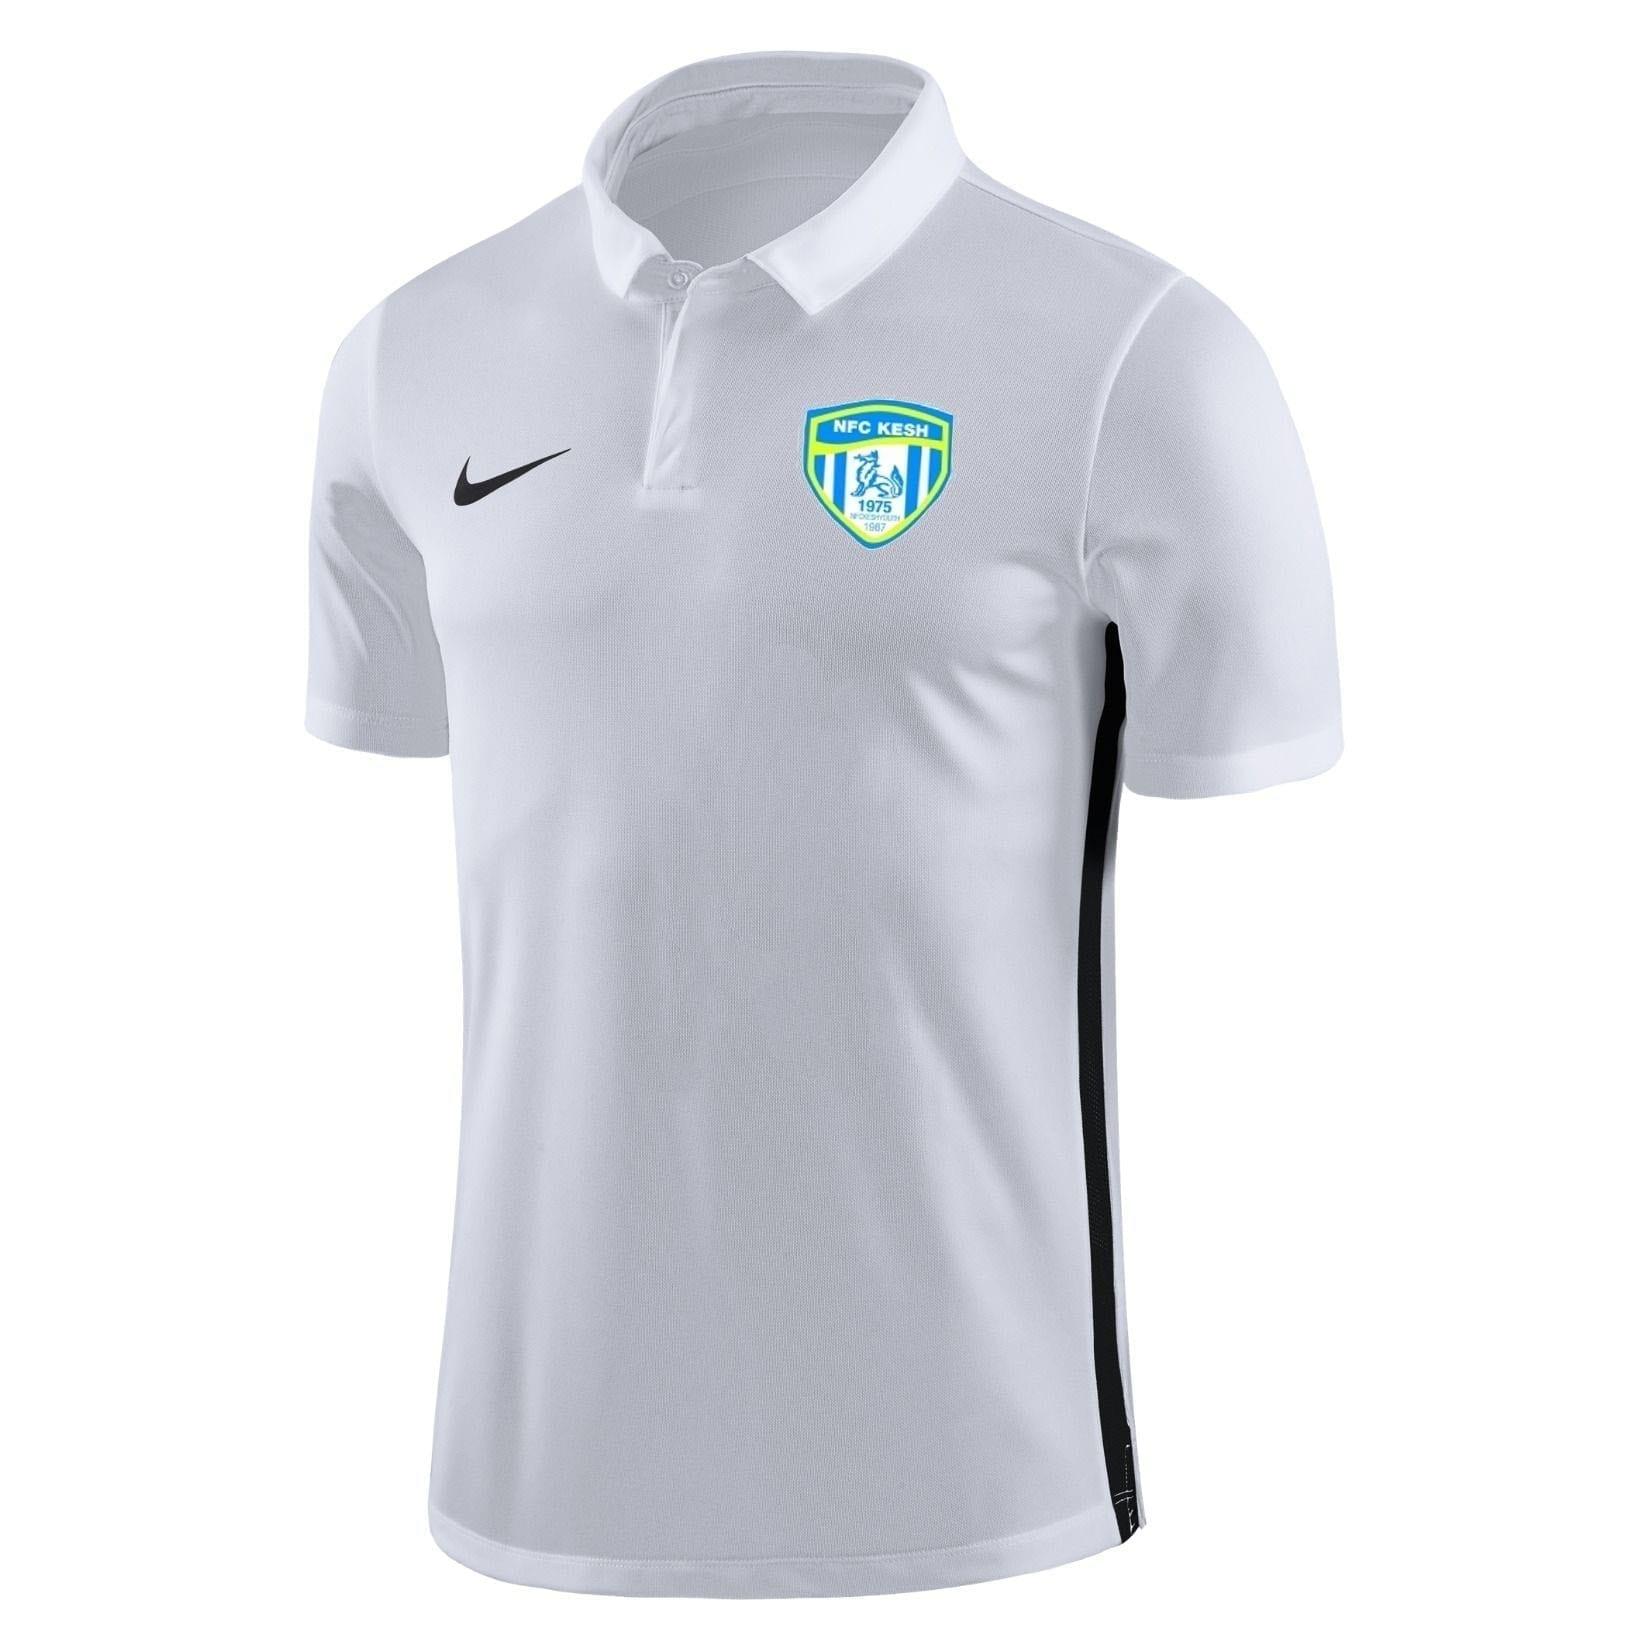 nfc kesh academy polo white 33149 p